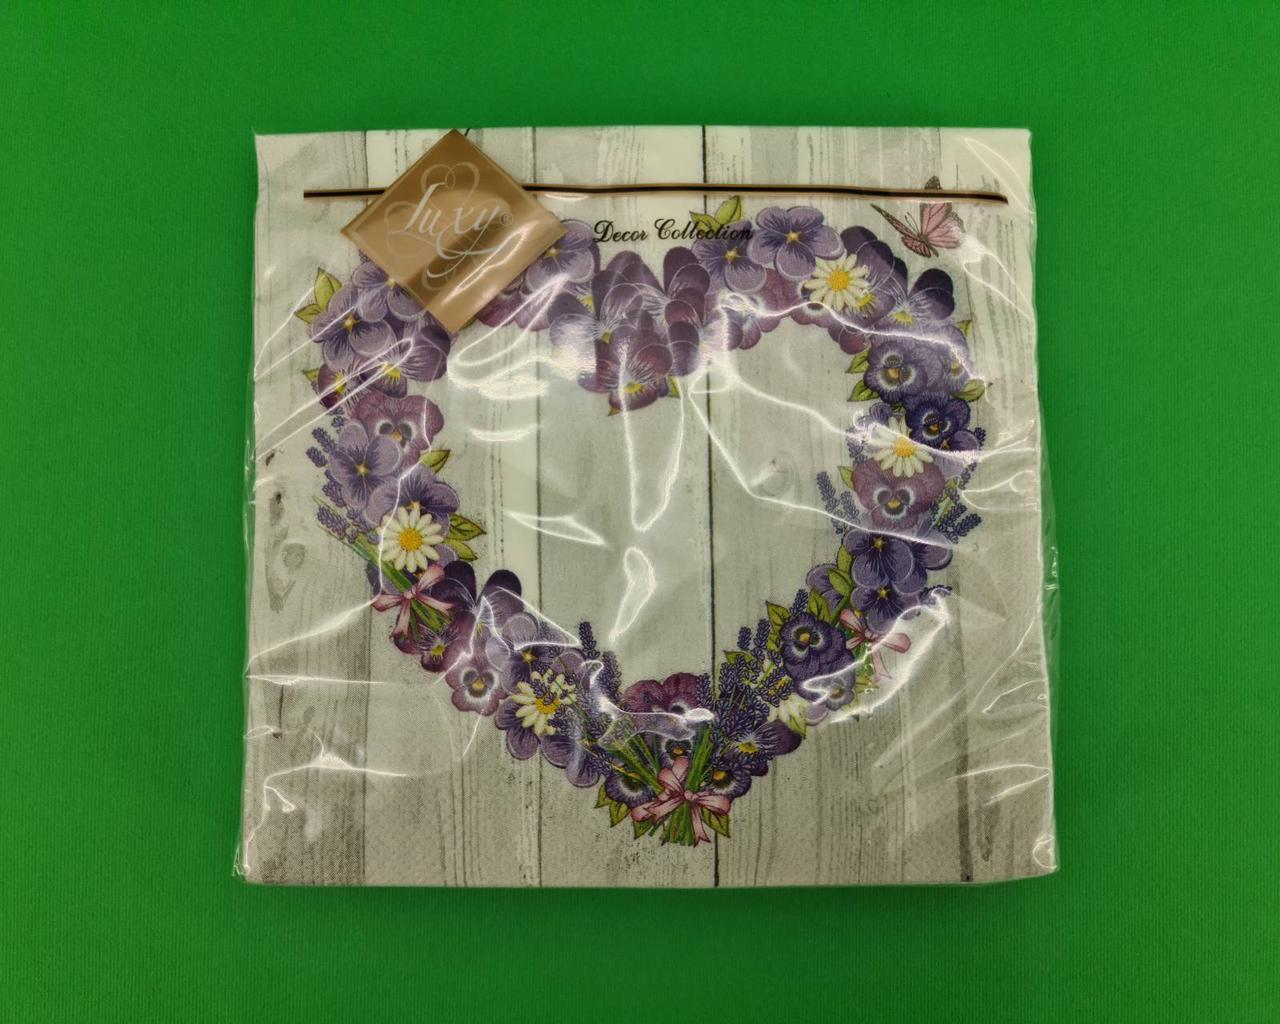 Дизайнерська серветка (ЗЗхЗЗ, 20шт) Luxy Квіткове серце (2091) (1 пач.)